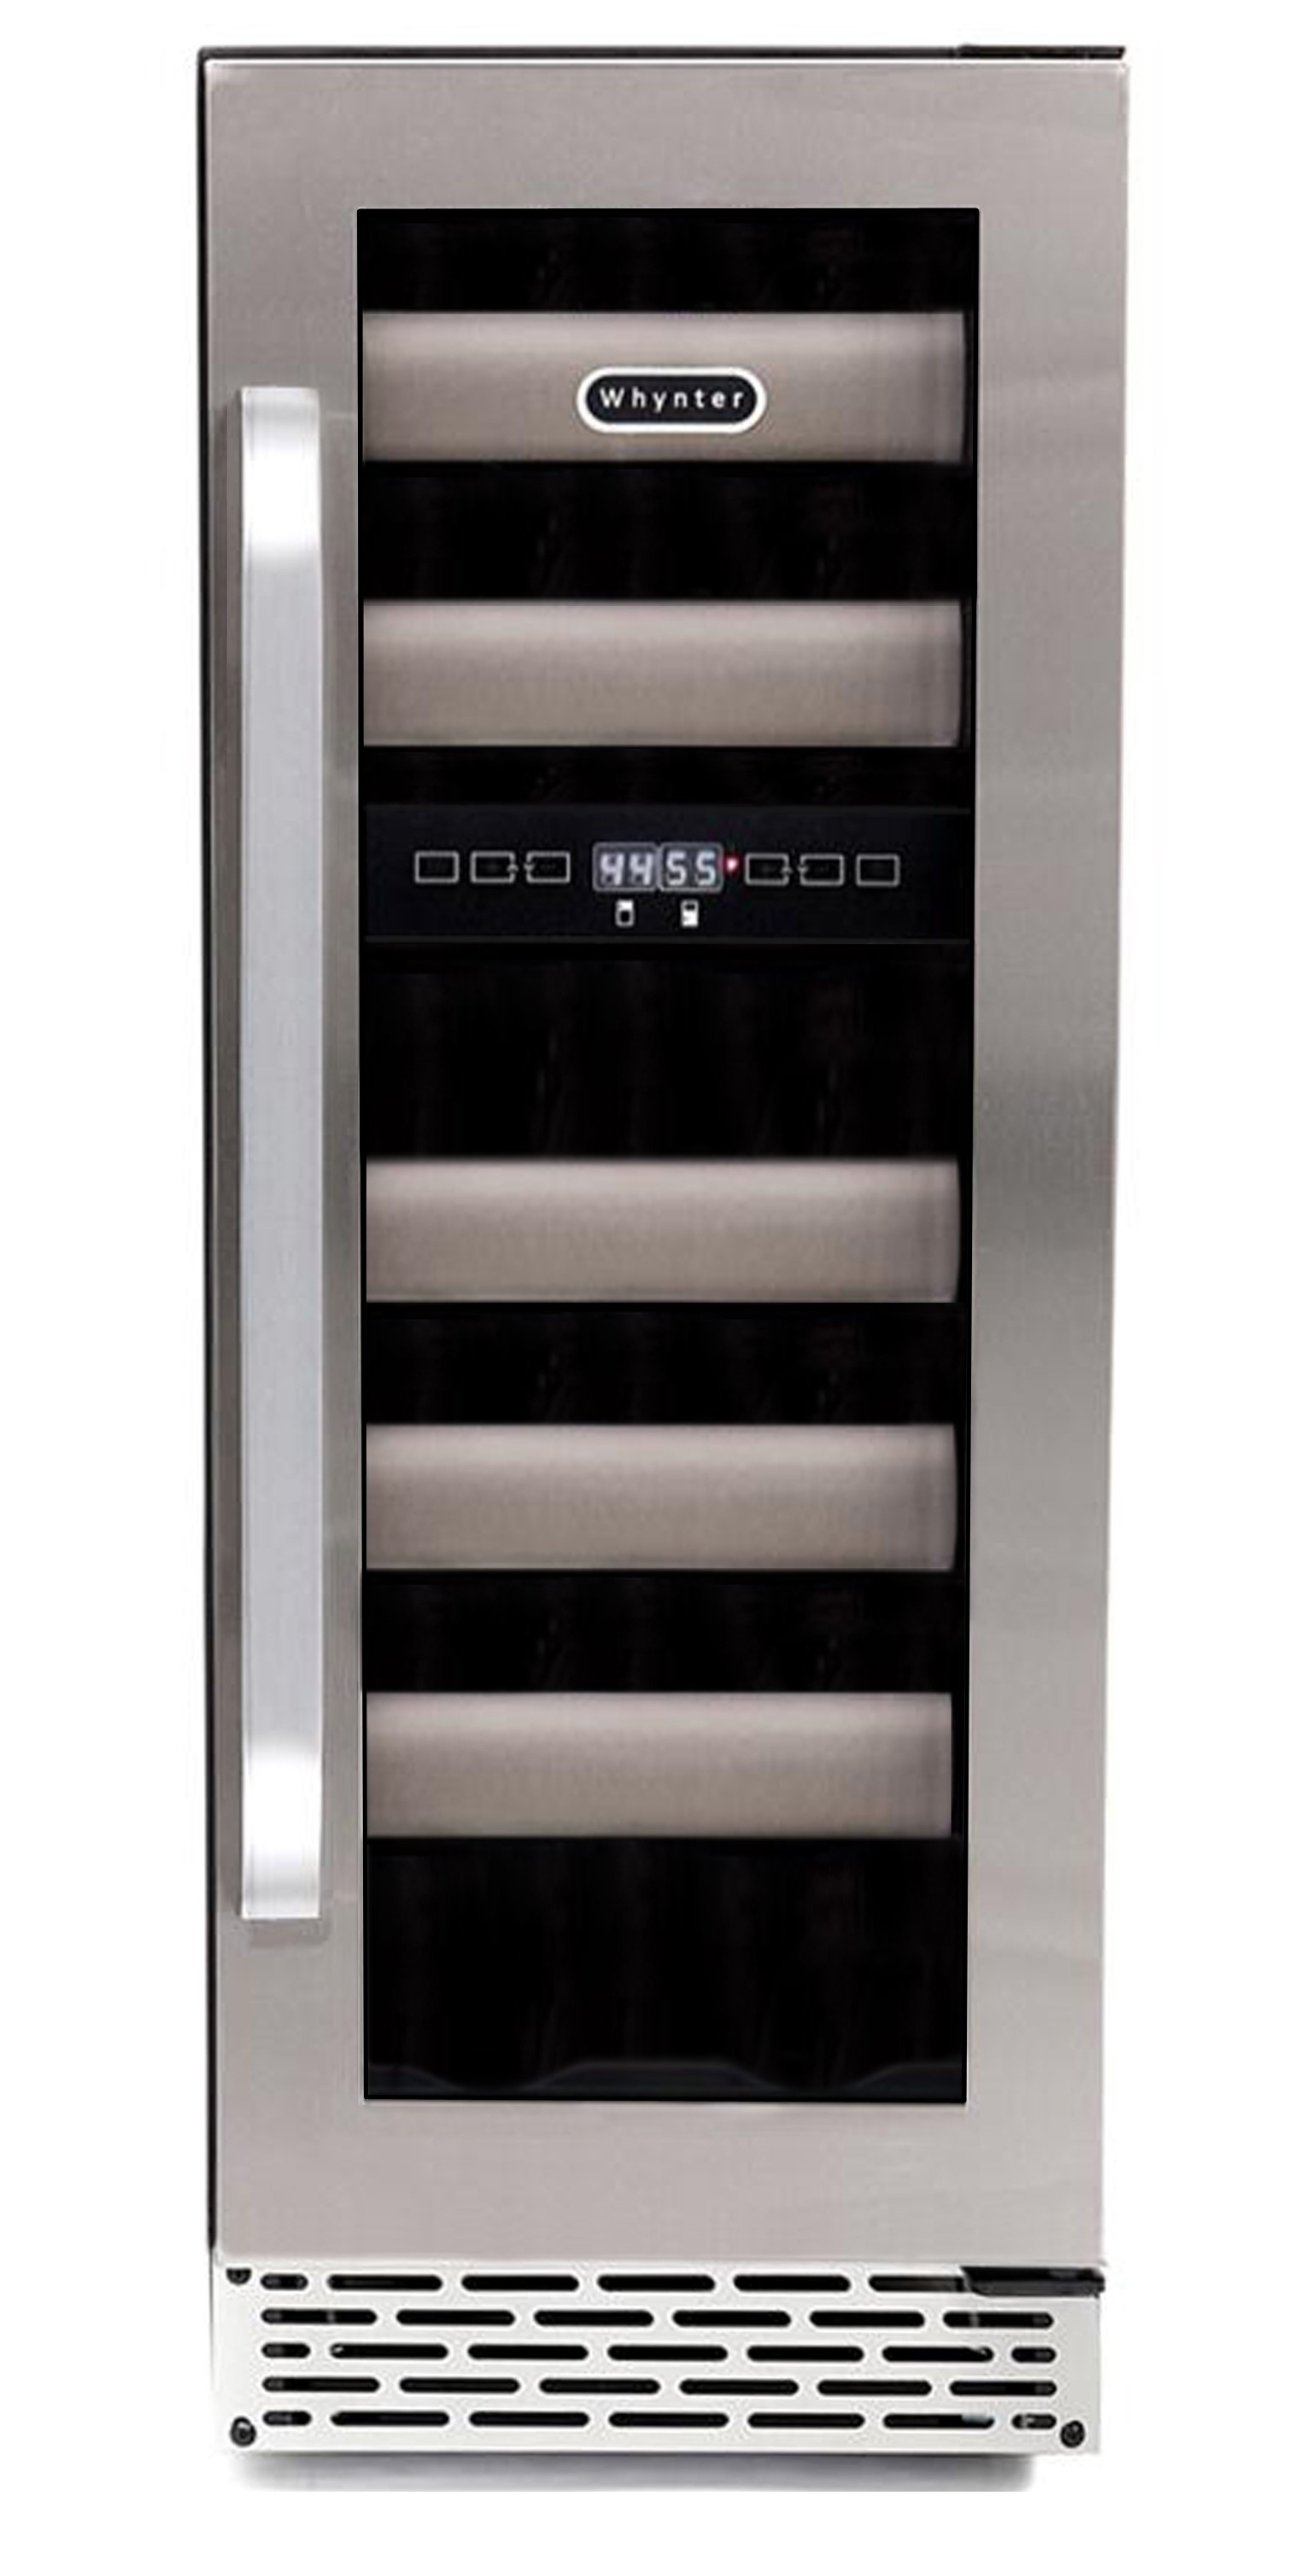 Whynter BWR-171DS Elite 17-Bottle Seamless Stainless Steel Door Dual Zone Built-in Wine Refrigerator